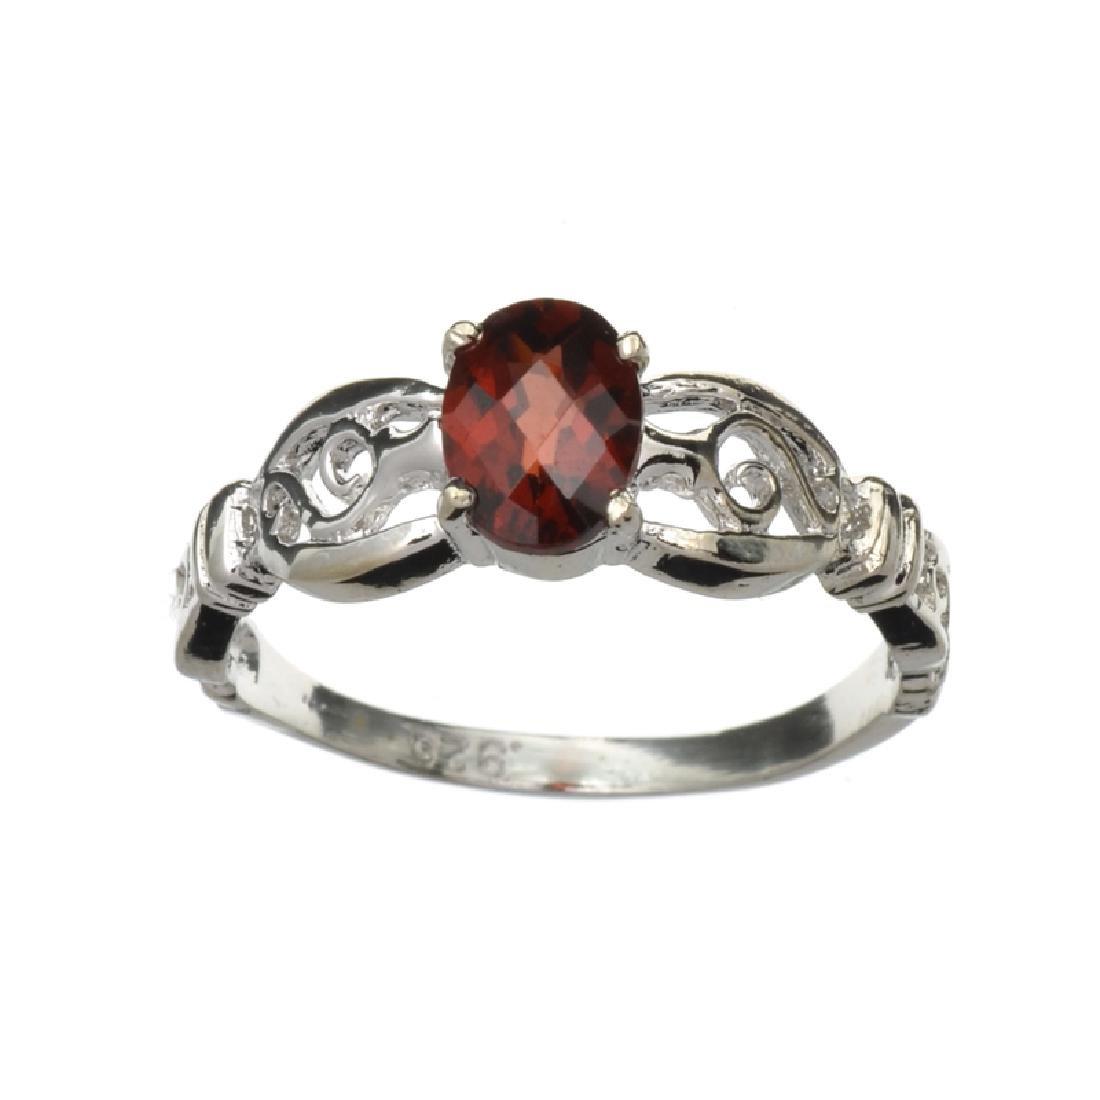 APP: 0.7k Fine Jewelry 1.00CT Oval Cut Almandite Garnet